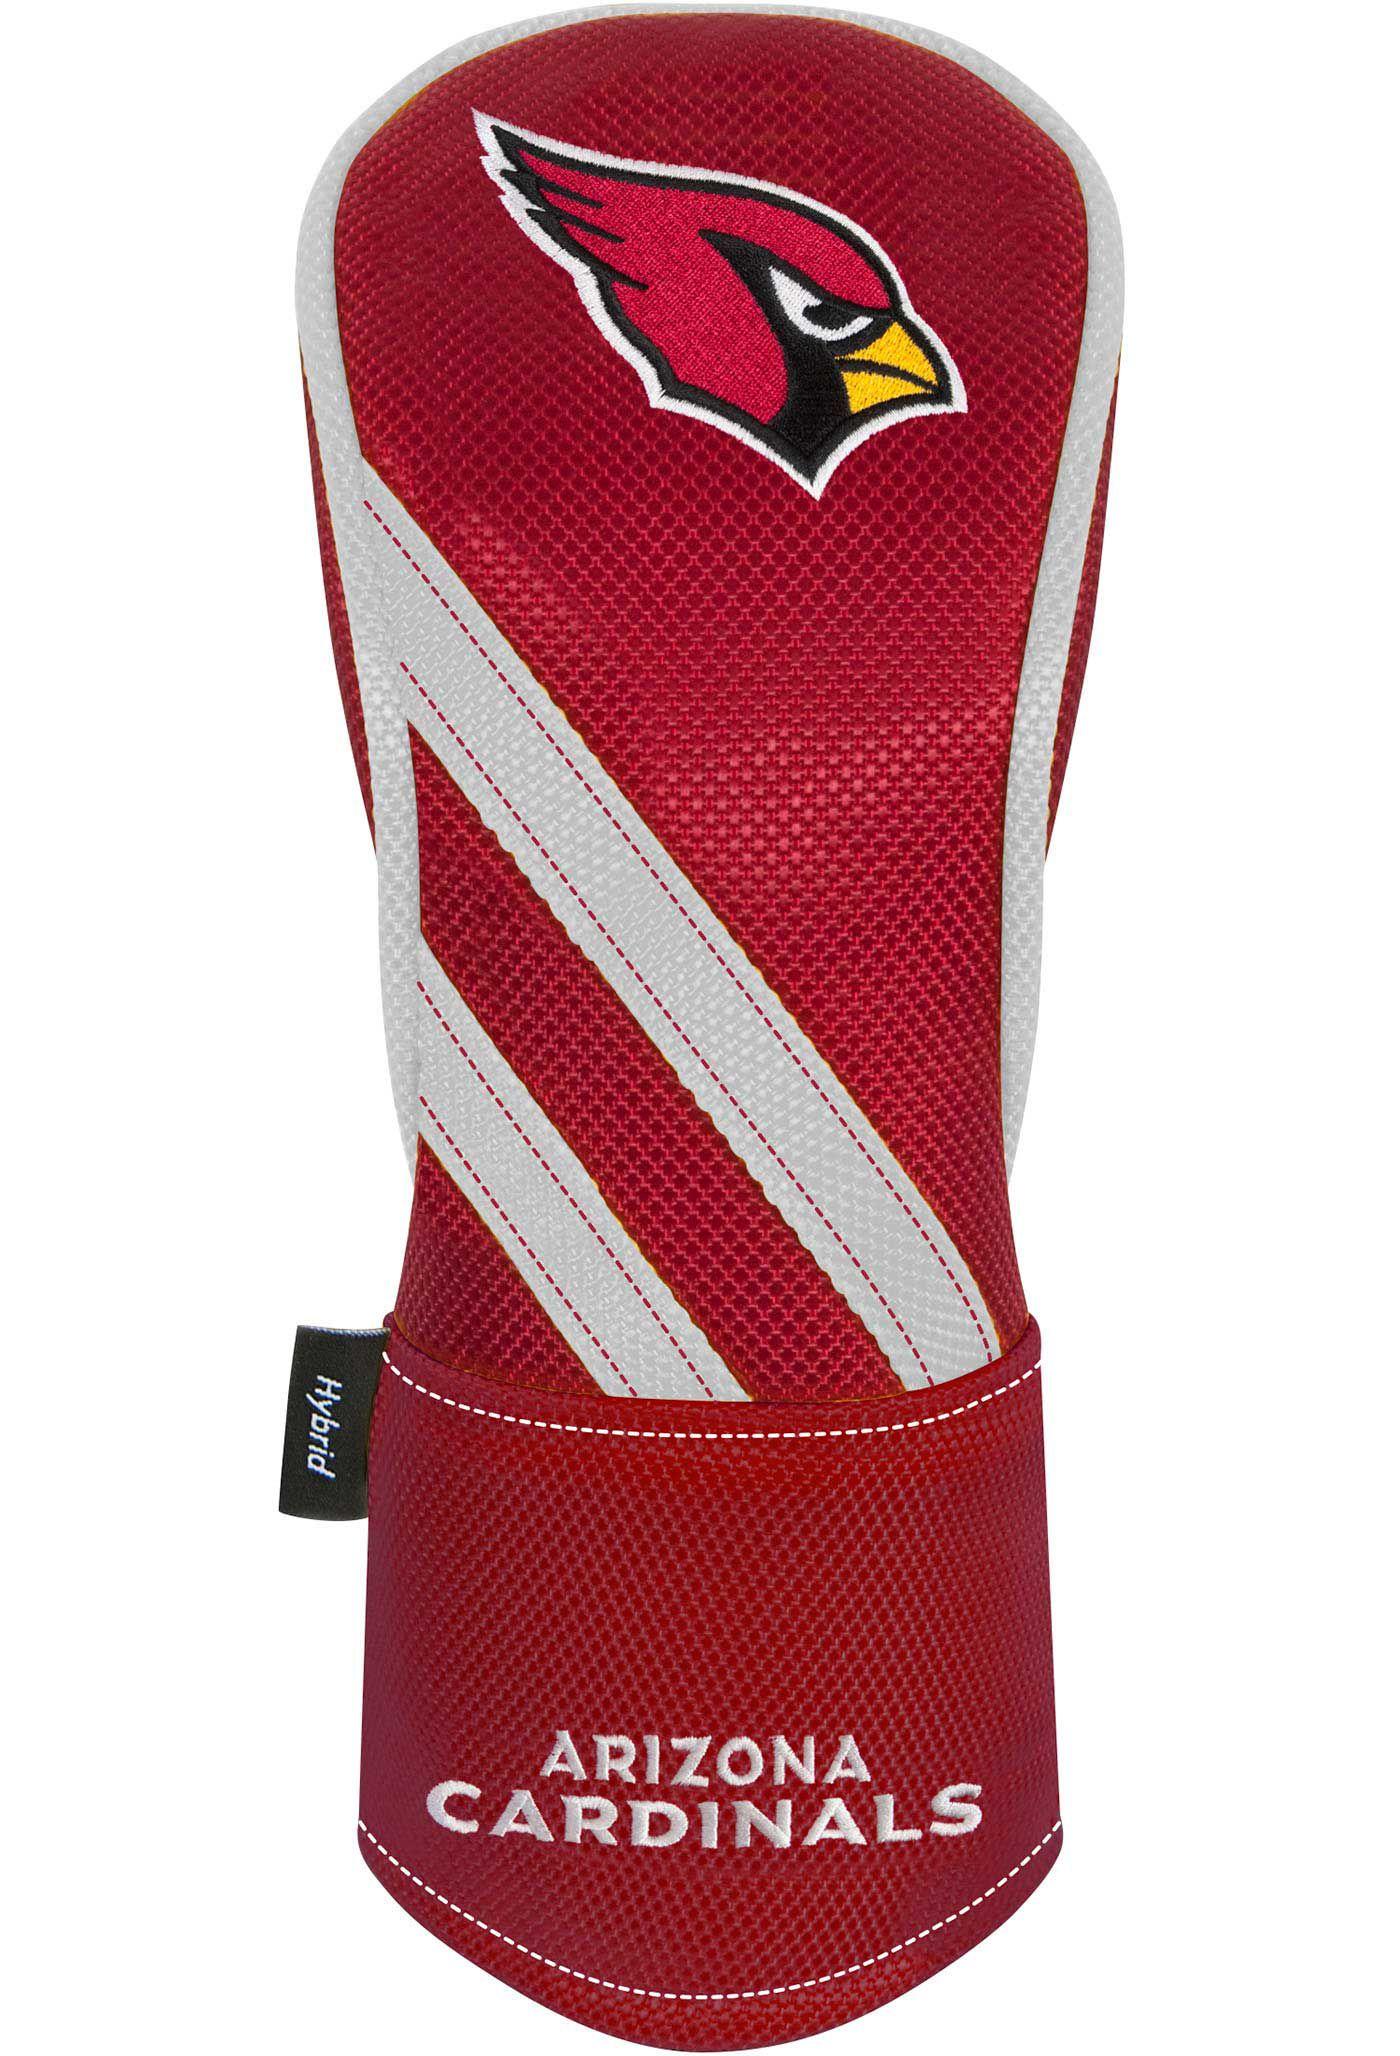 Team Effort Arizona Cardinals Hybrid Headcover